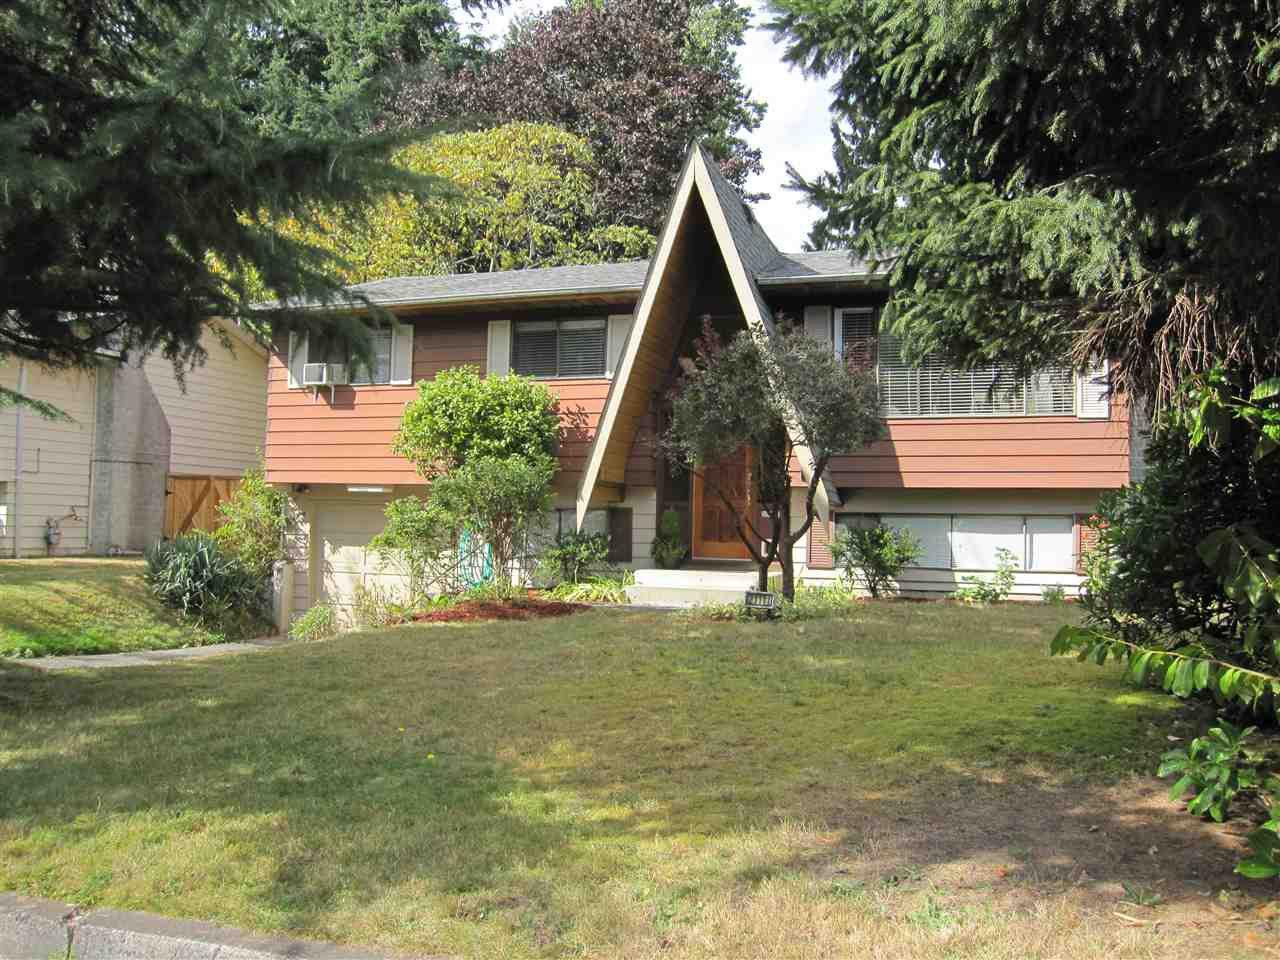 Main Photo: 21111 119 Avenue in Maple Ridge: Southwest Maple Ridge House for sale : MLS®# R2103440